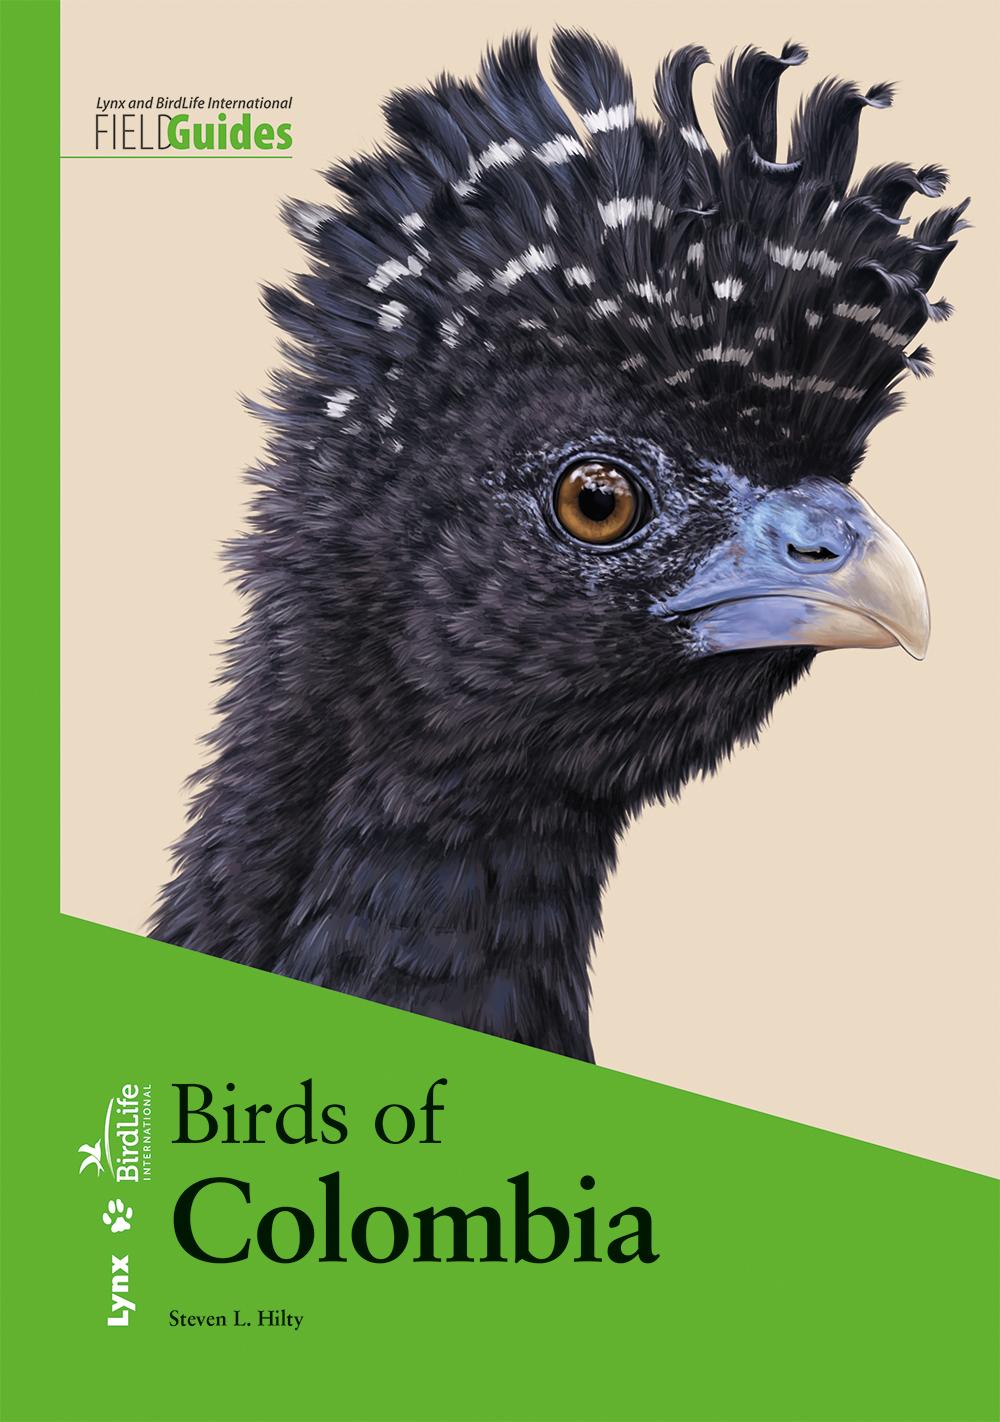 Birds of Colombia - BirdGuides